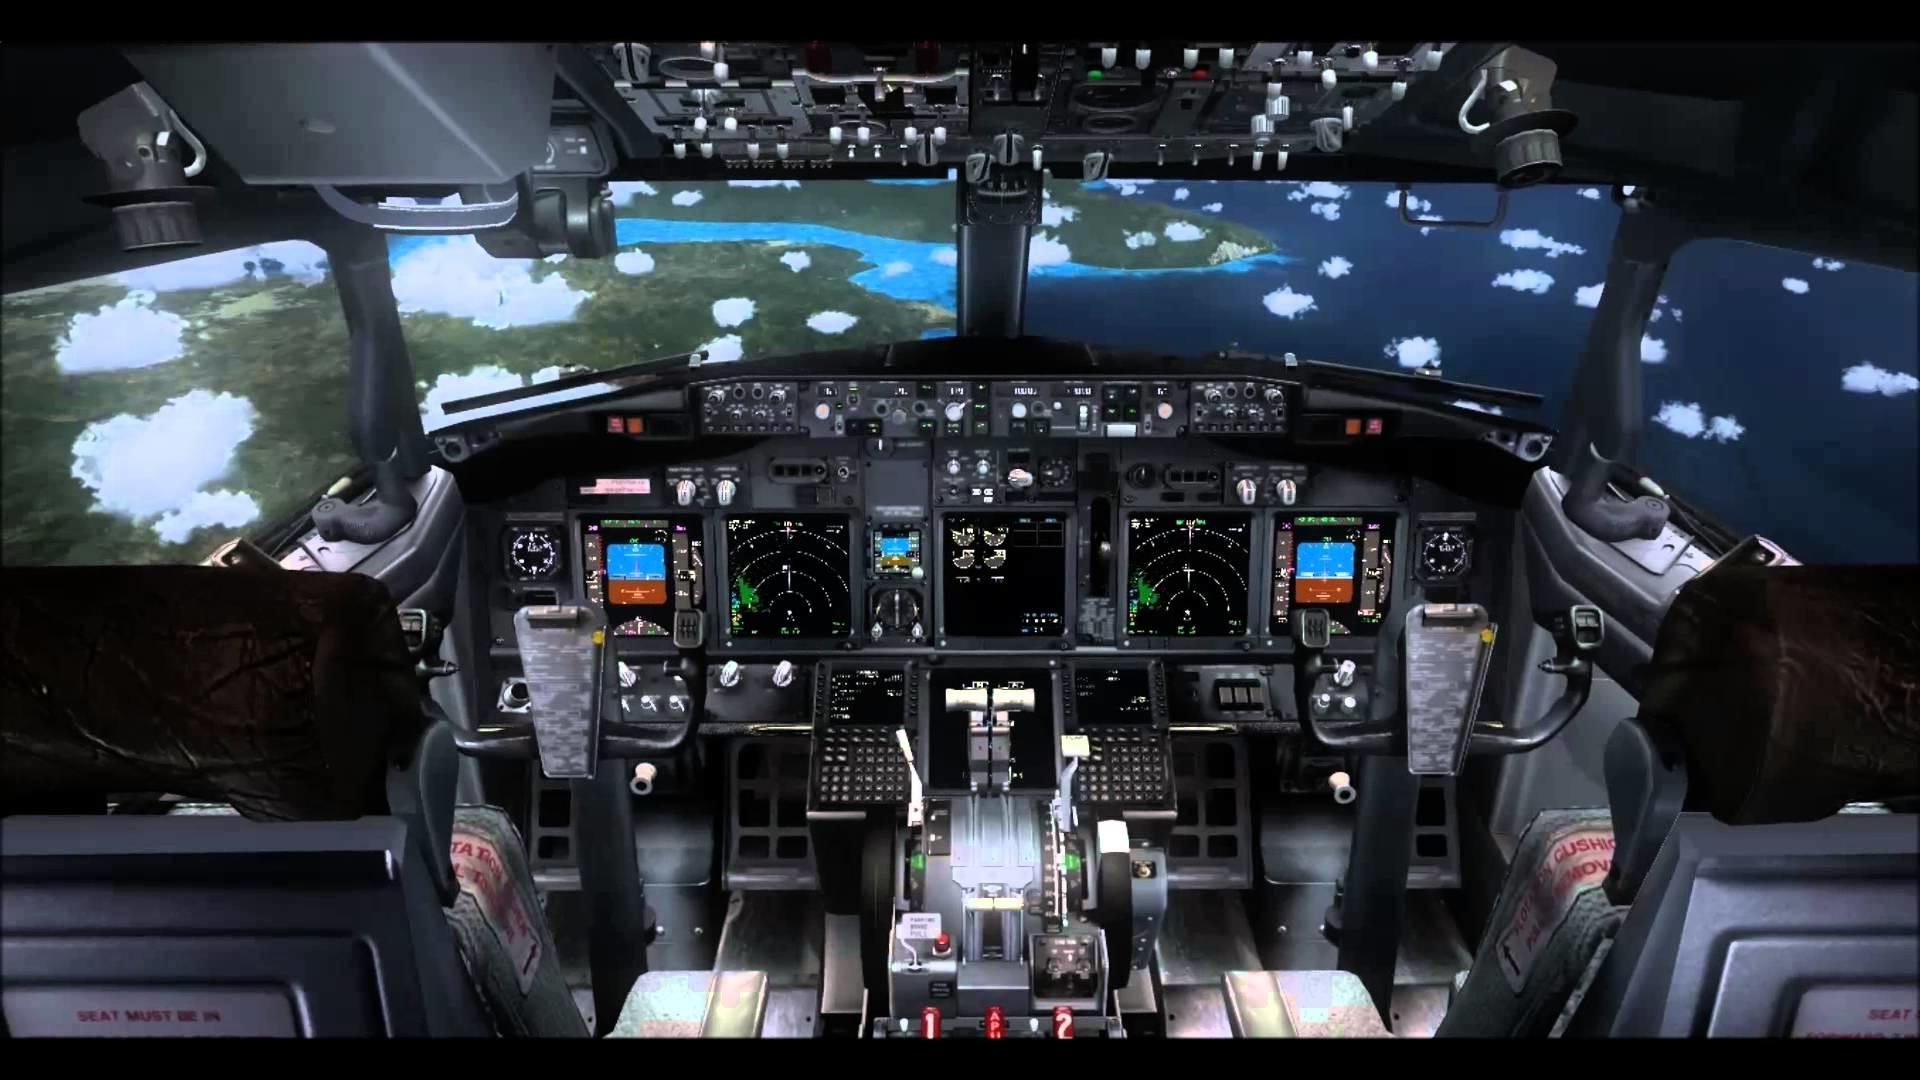 cockpit wallpapers WallpaperUP